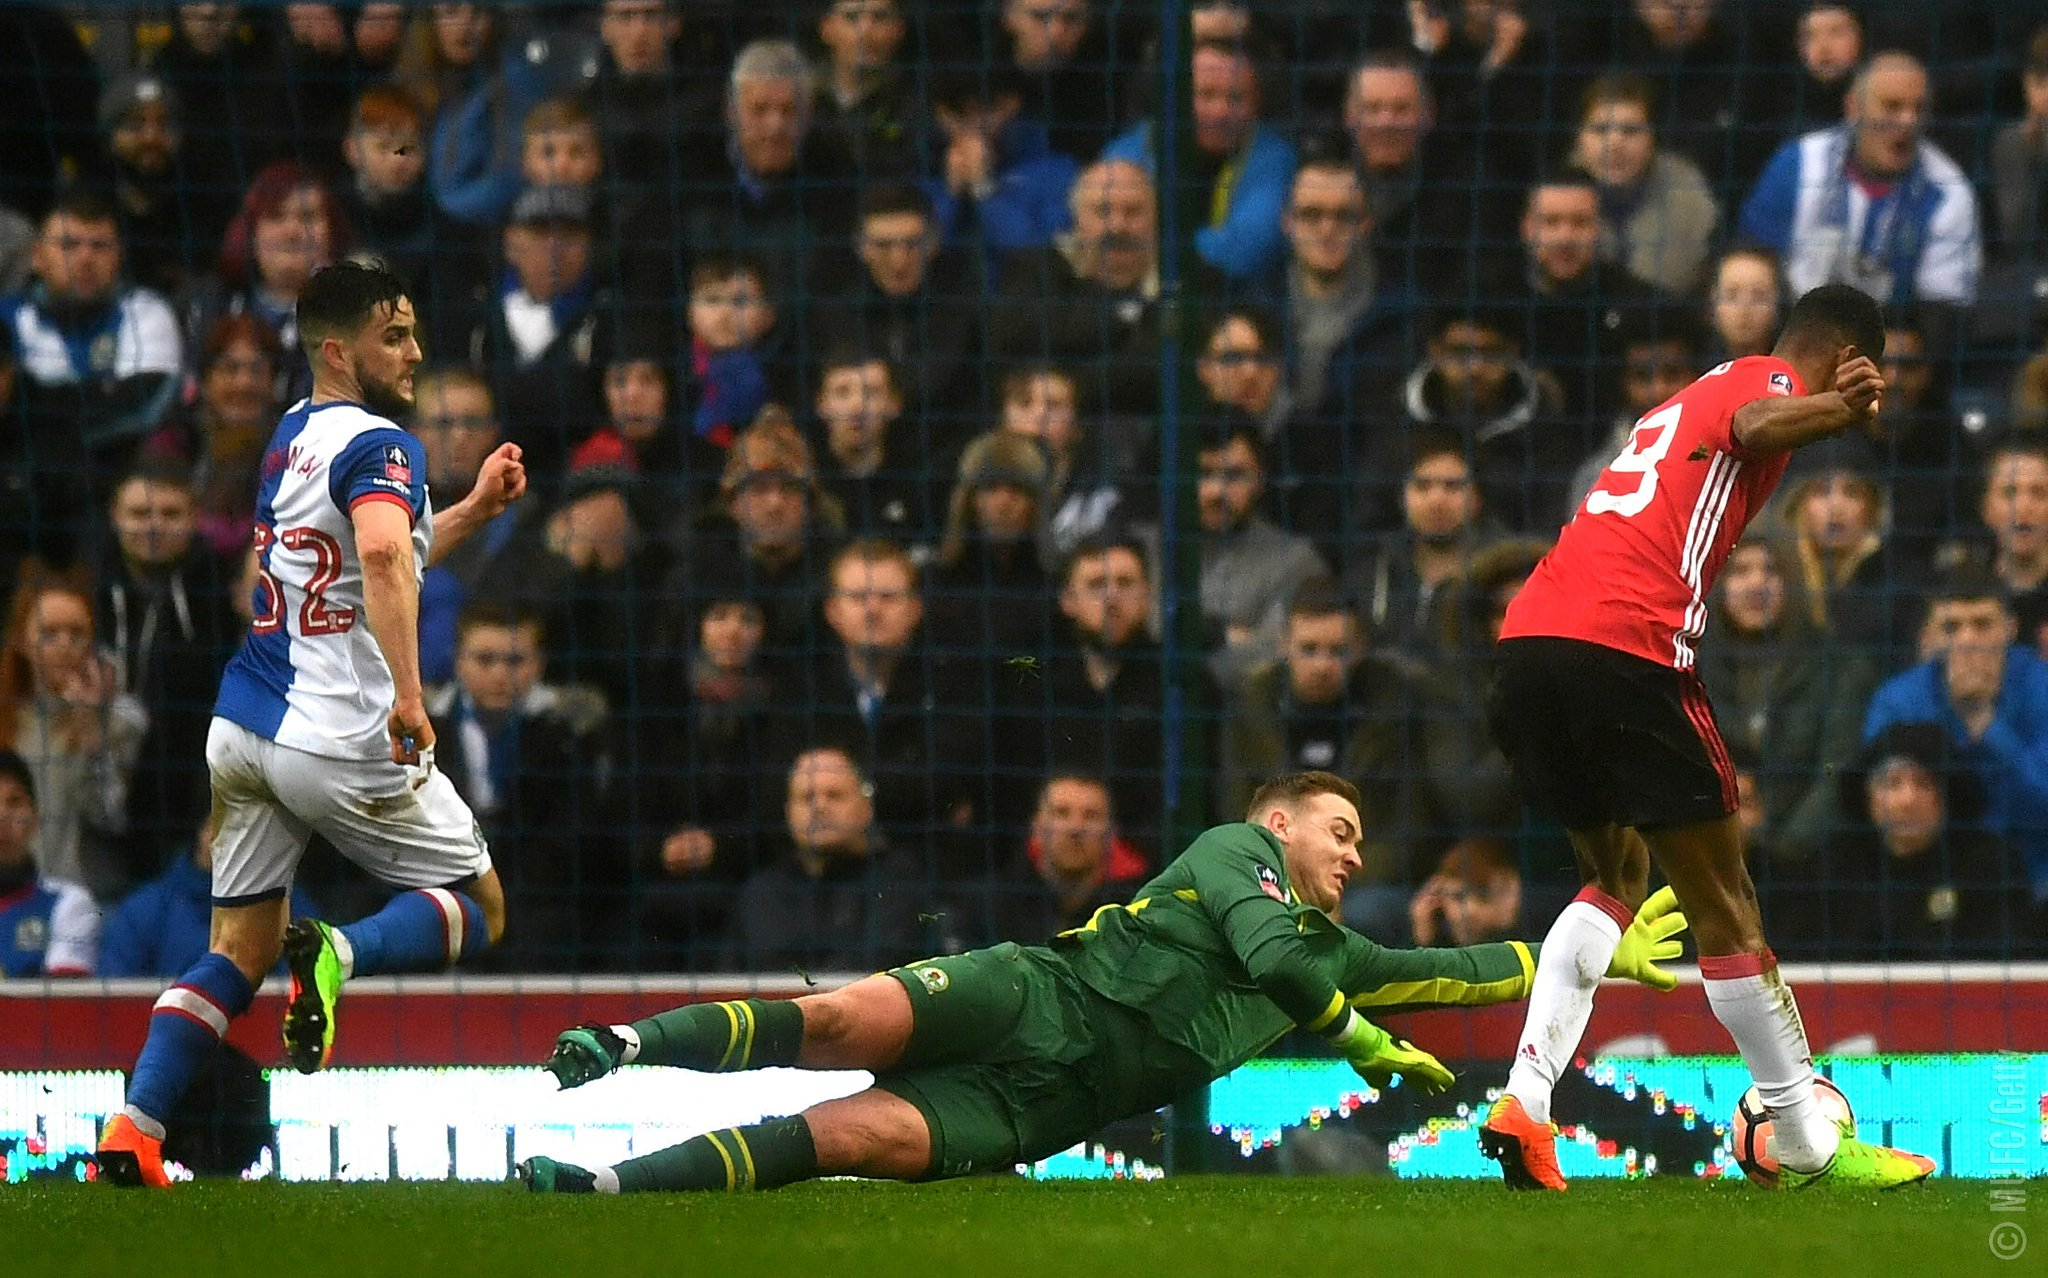 FA Cup: Rashford, Zlatan Fire United Overcome Resilient Blackburn